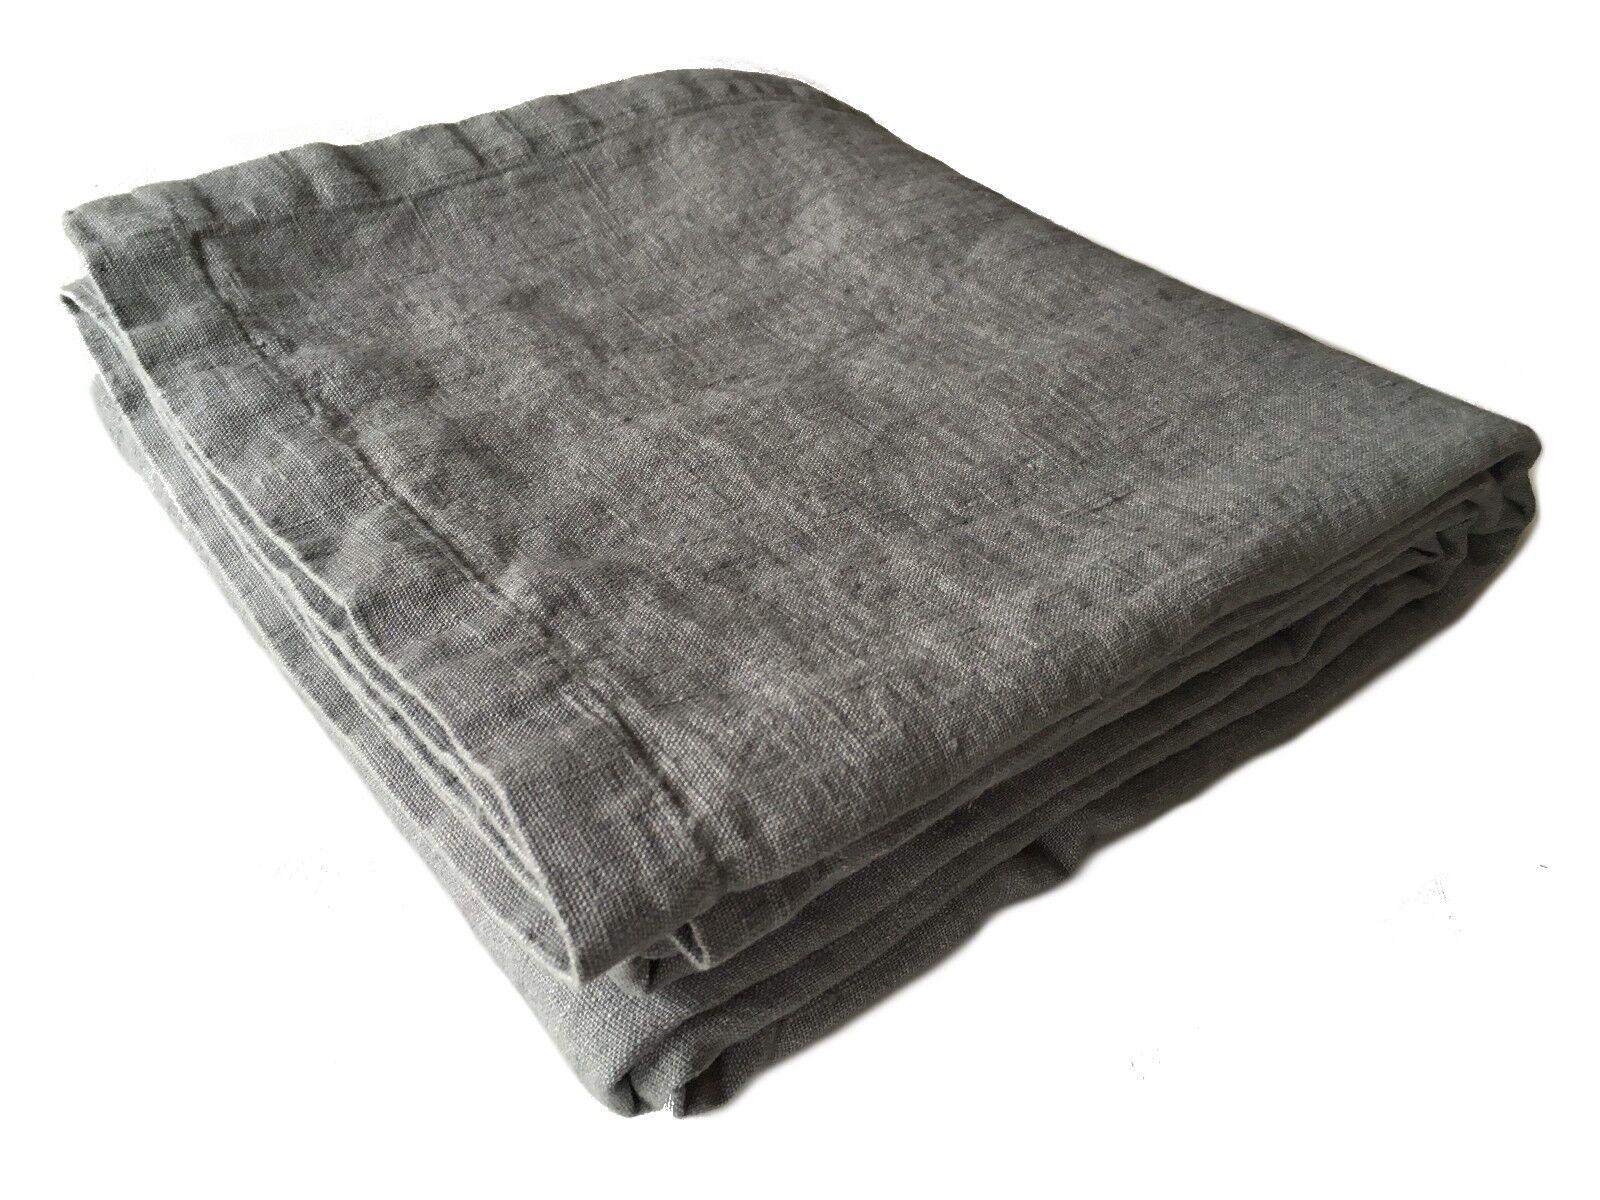 XXXL letto su lancio PLAID COPERTA  rasa  100% LINO 250 x 280 cm GRIGIO  Stonewashed